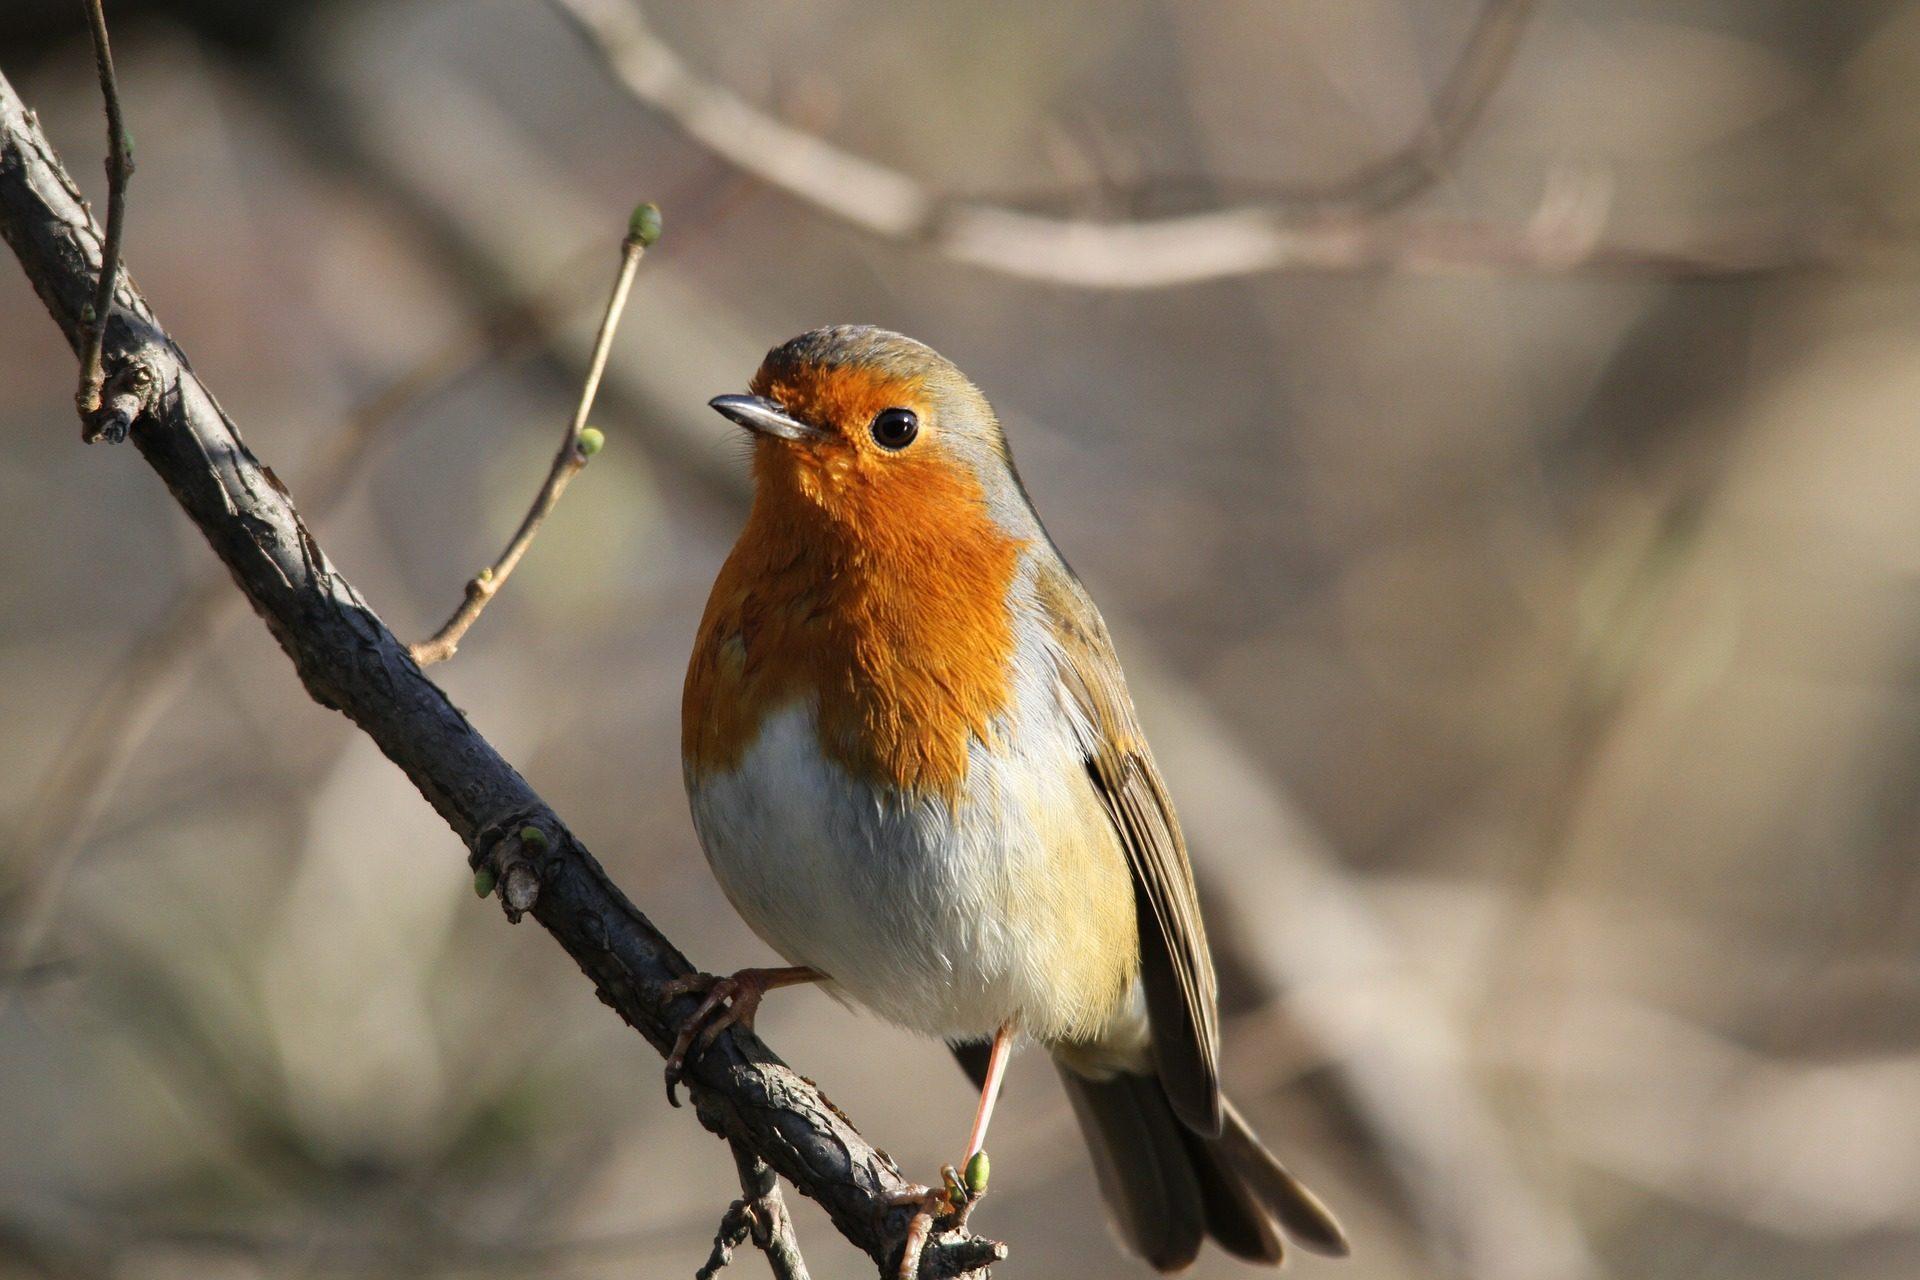 pájaro, robin, petirrojo, rama, árbol - Fondos de Pantalla HD - professor-falken.com